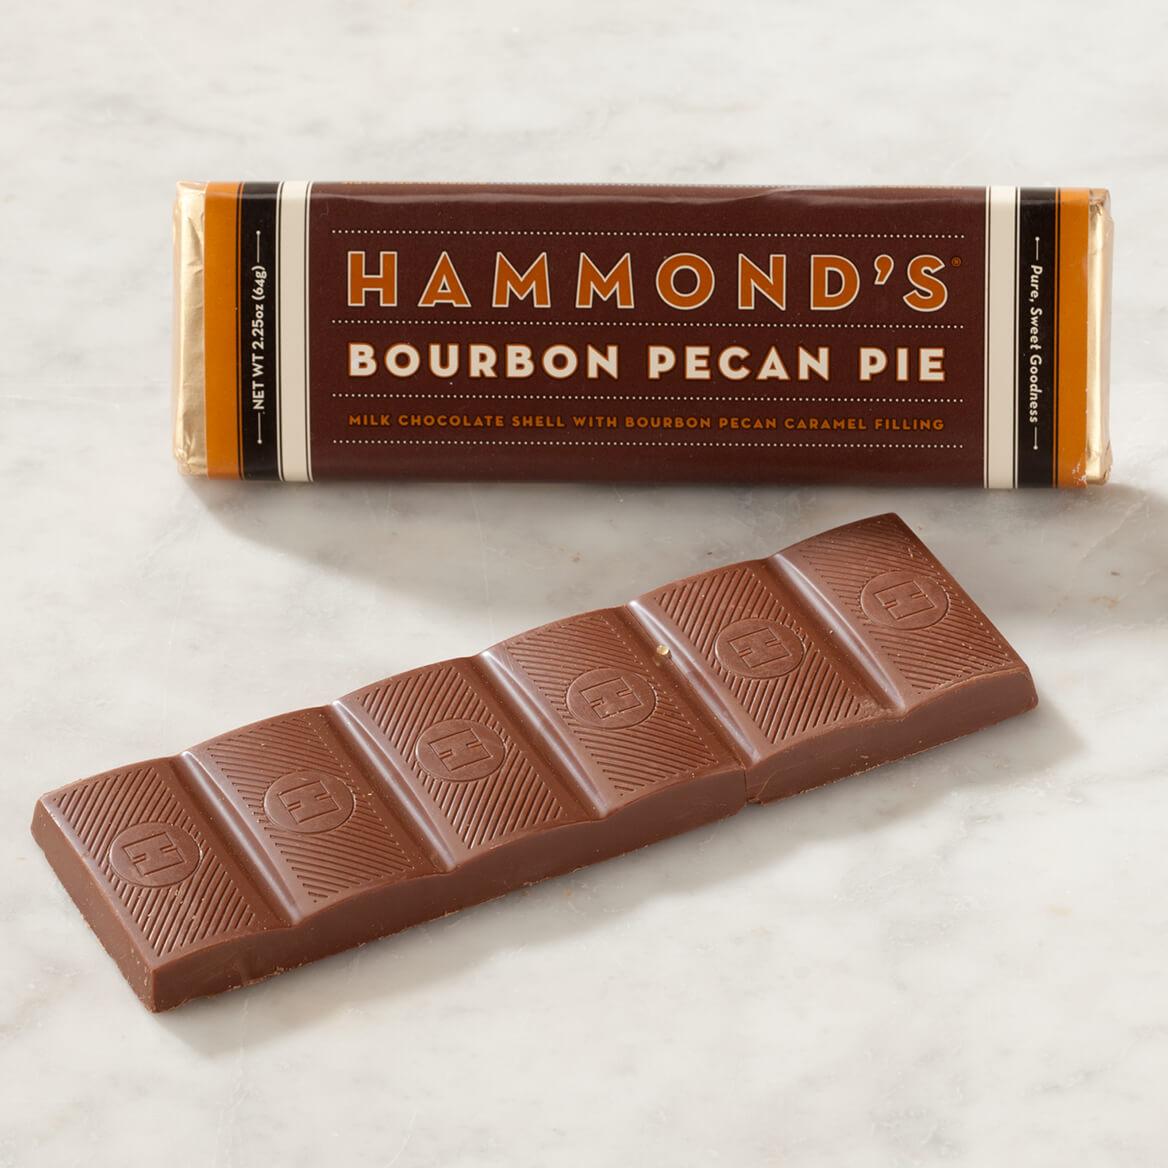 Hammond's Bourbon Pecan Pie Milk Chocolate Bar - Miles Kimball